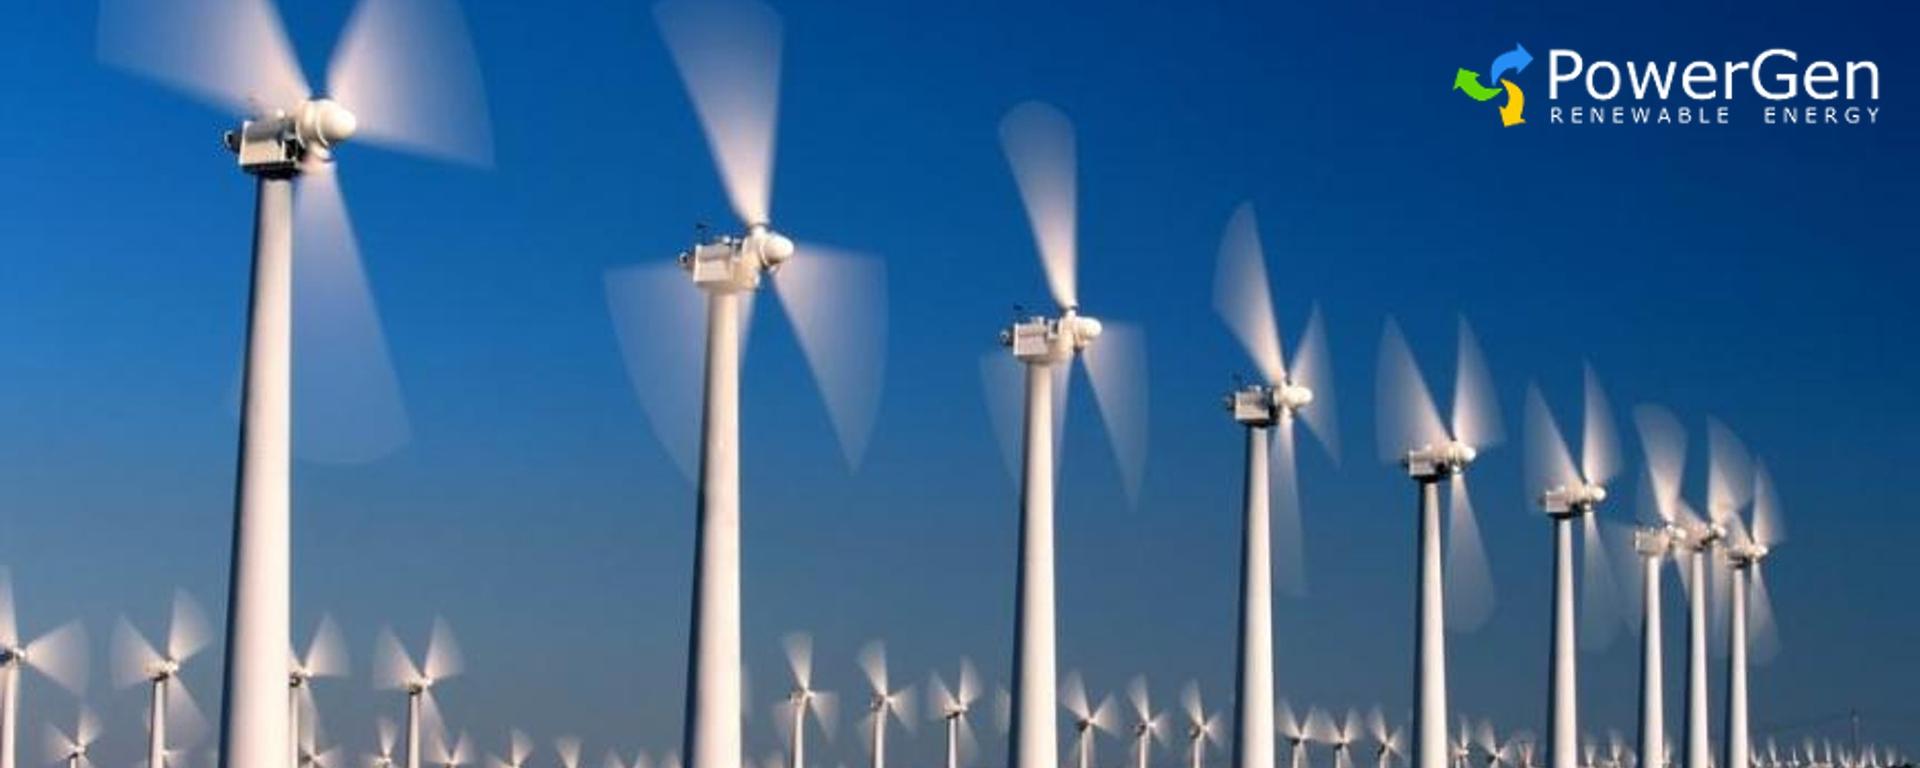 PowerGen Renewable Energy - Senior Engineering Manager Movemeback African opportunity cover image